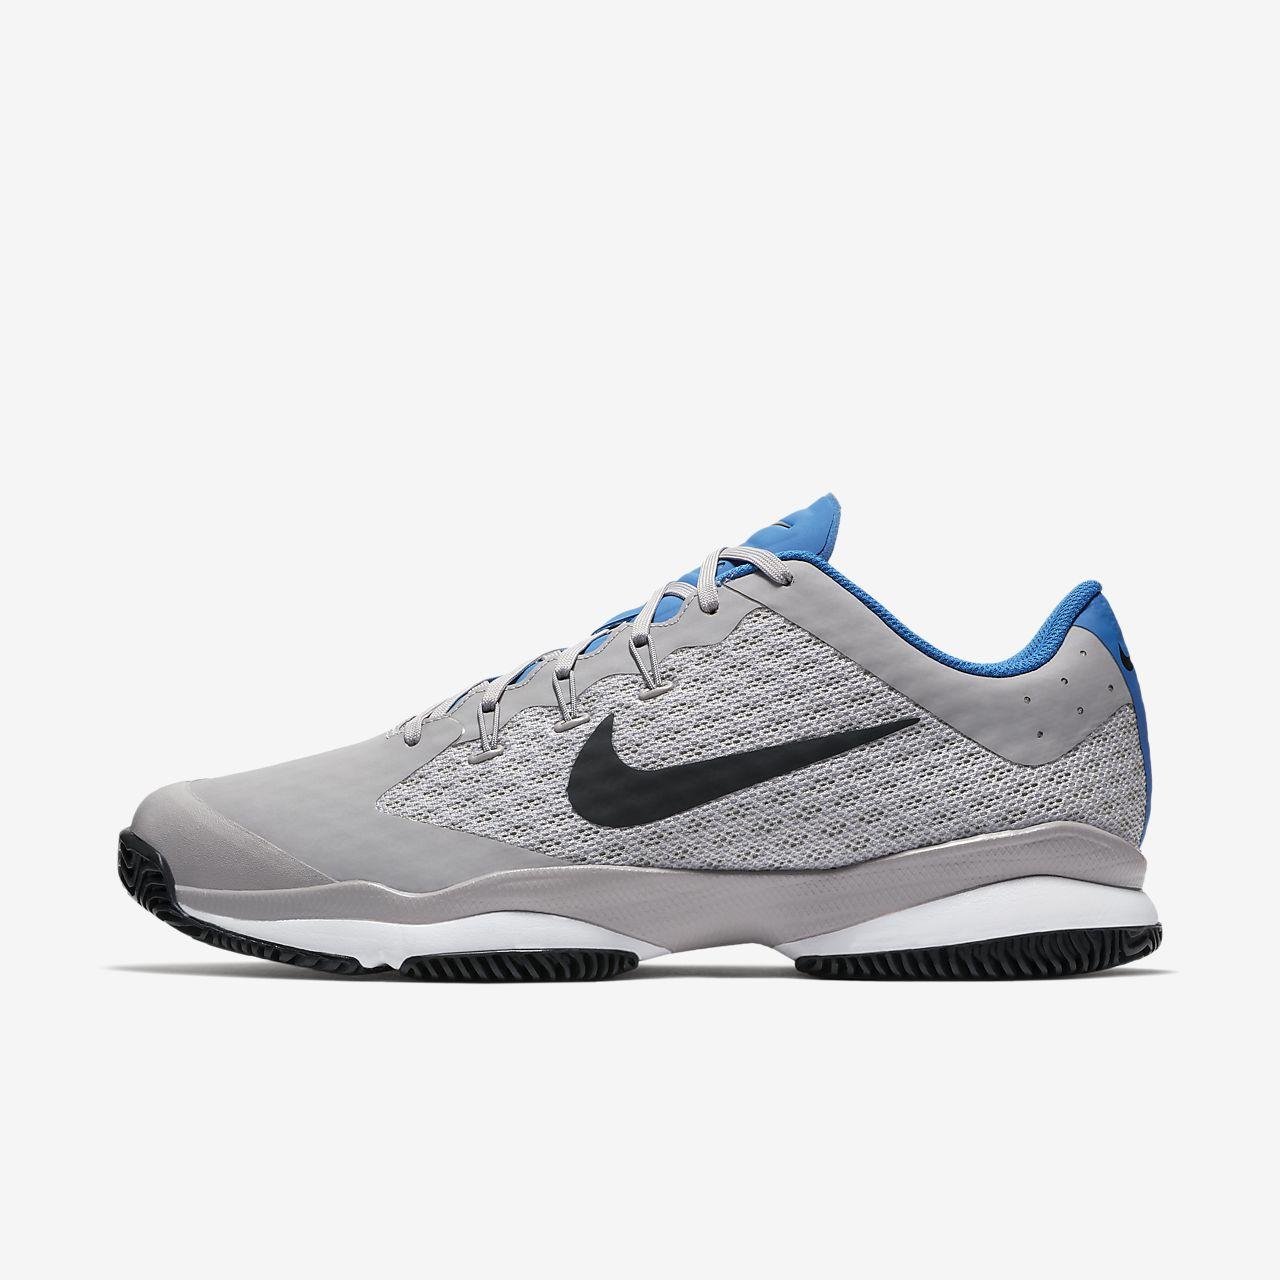 Nike Chaussure de tennis Air Zoom Ultra  bleu aqua  Baskets Femme -Rouge - Rouge - 41 EU (7 UK)  50 EU  Baskets Adulte Mixte 3PyJX